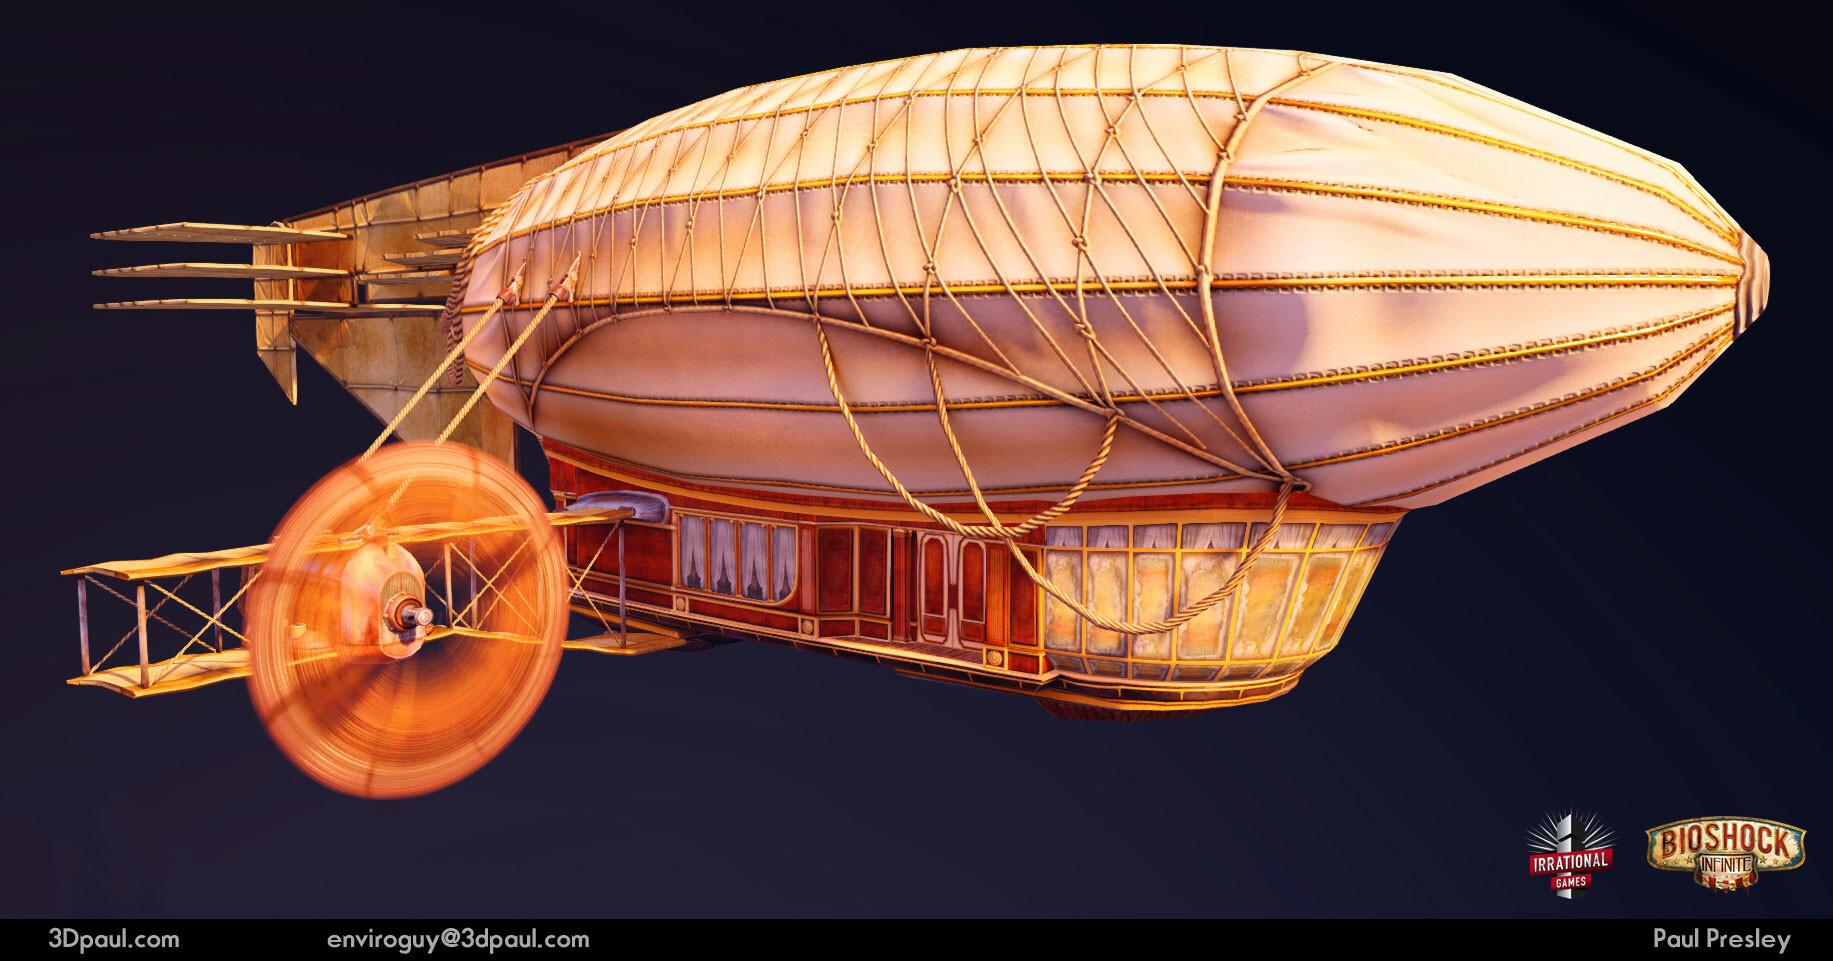 Paul presley 03 airshiplimo